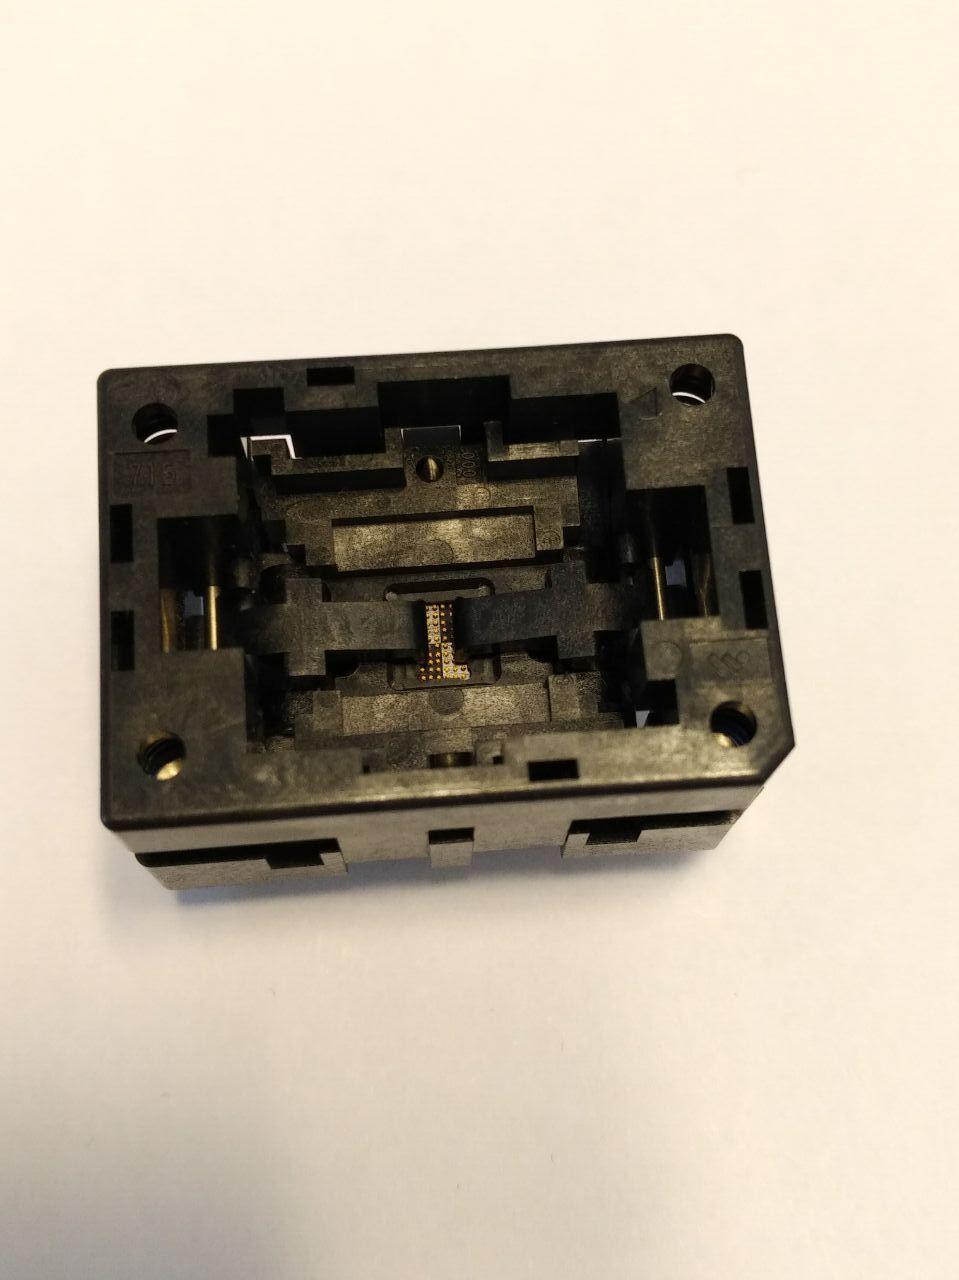 Wells-cti IC Test Soketi 715-05206-504-AO BGA52P 0.5mm Pitch 6x6mm sokette yanmak